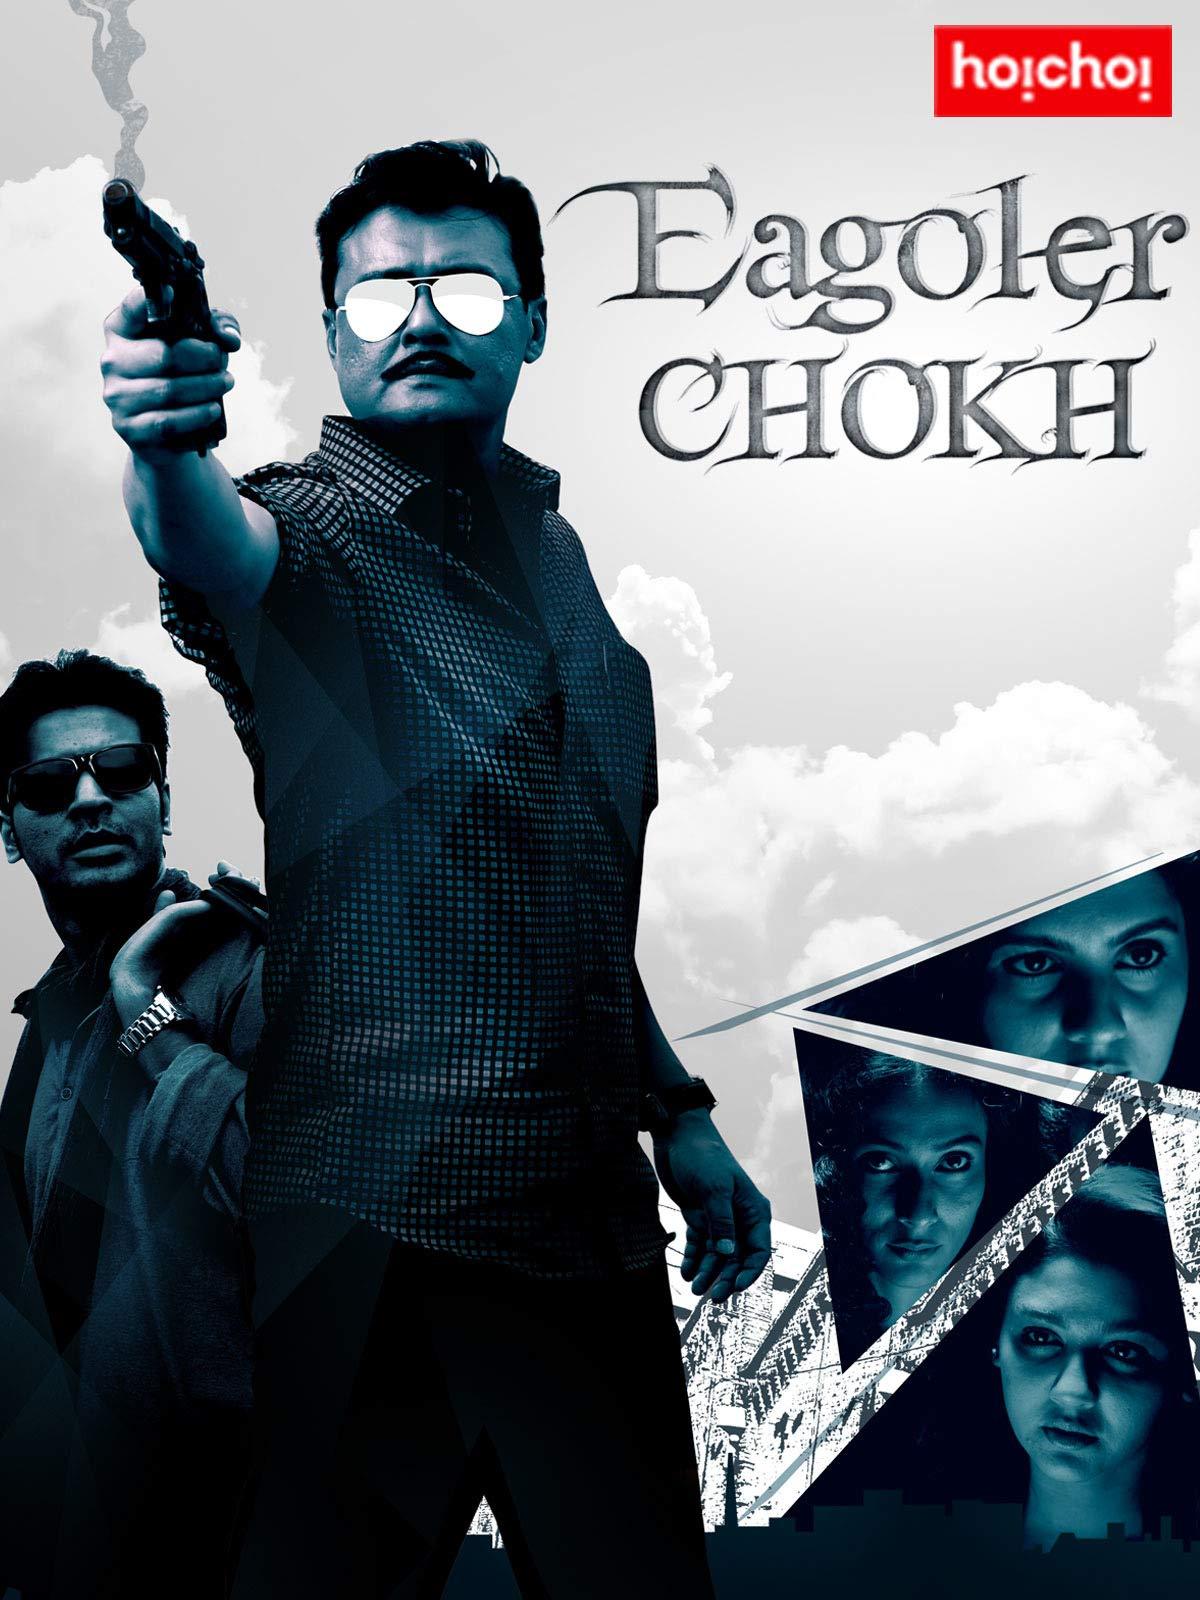 Eagoler Chokh 2021 Bengali Movie 720p HDRip x264 AAC 950MB Download